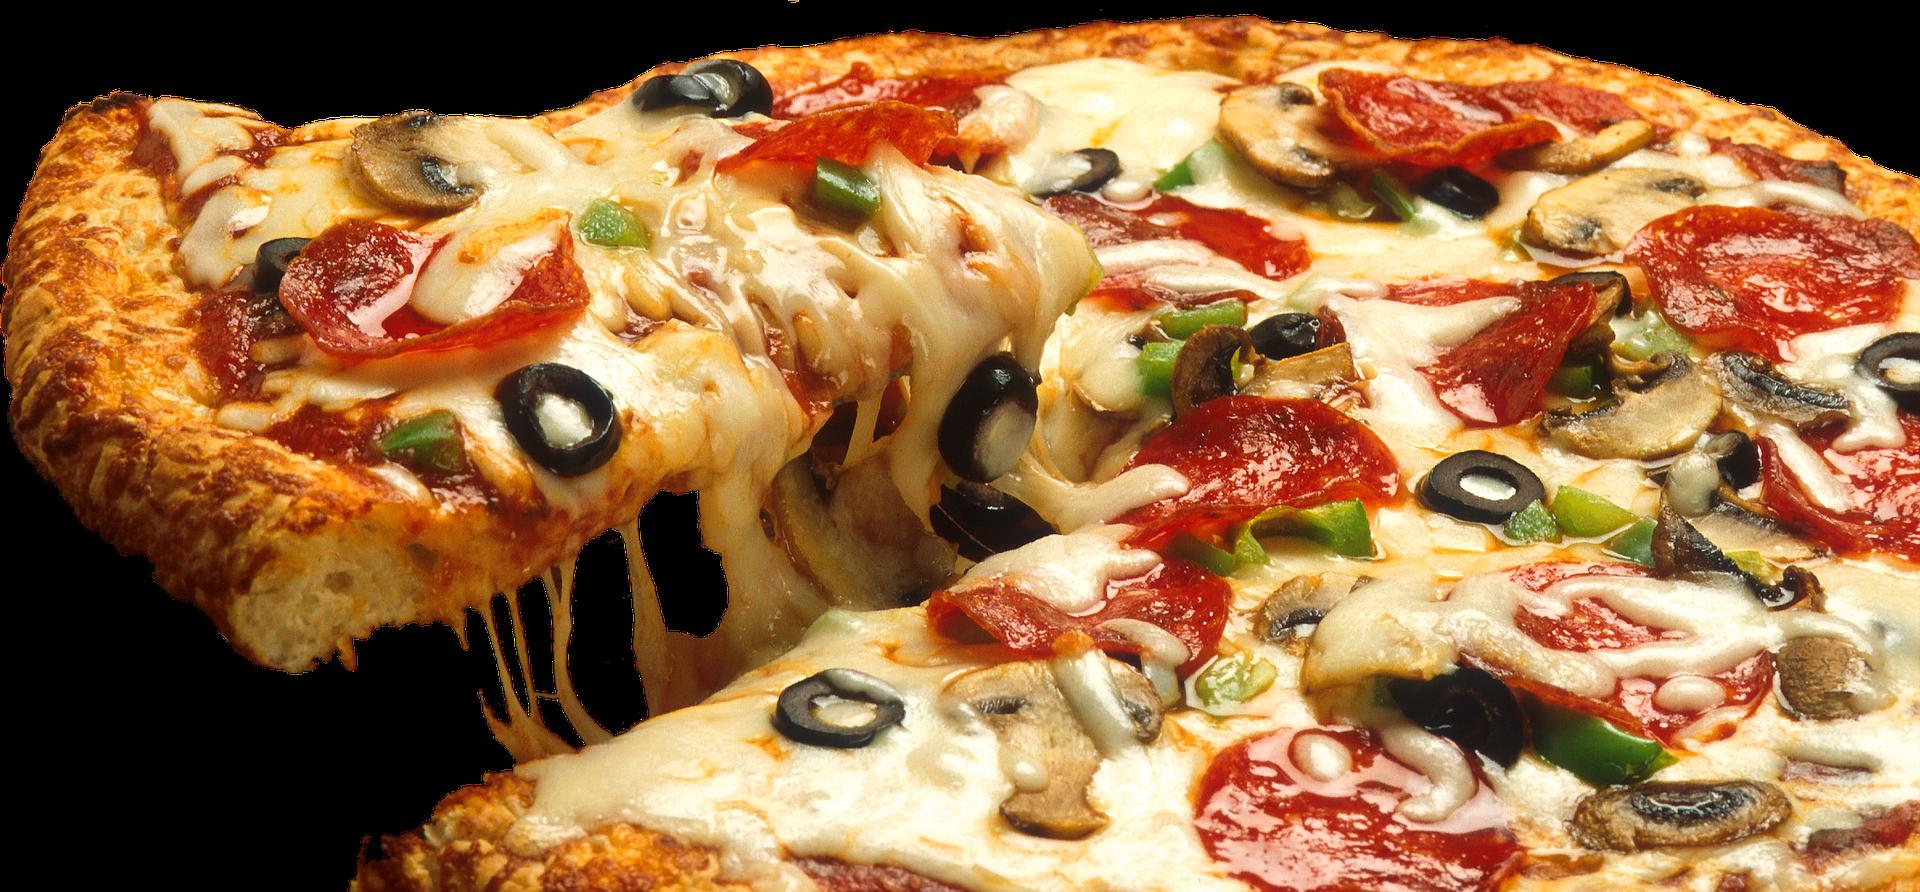 supreme-pizza-619133_1920.png